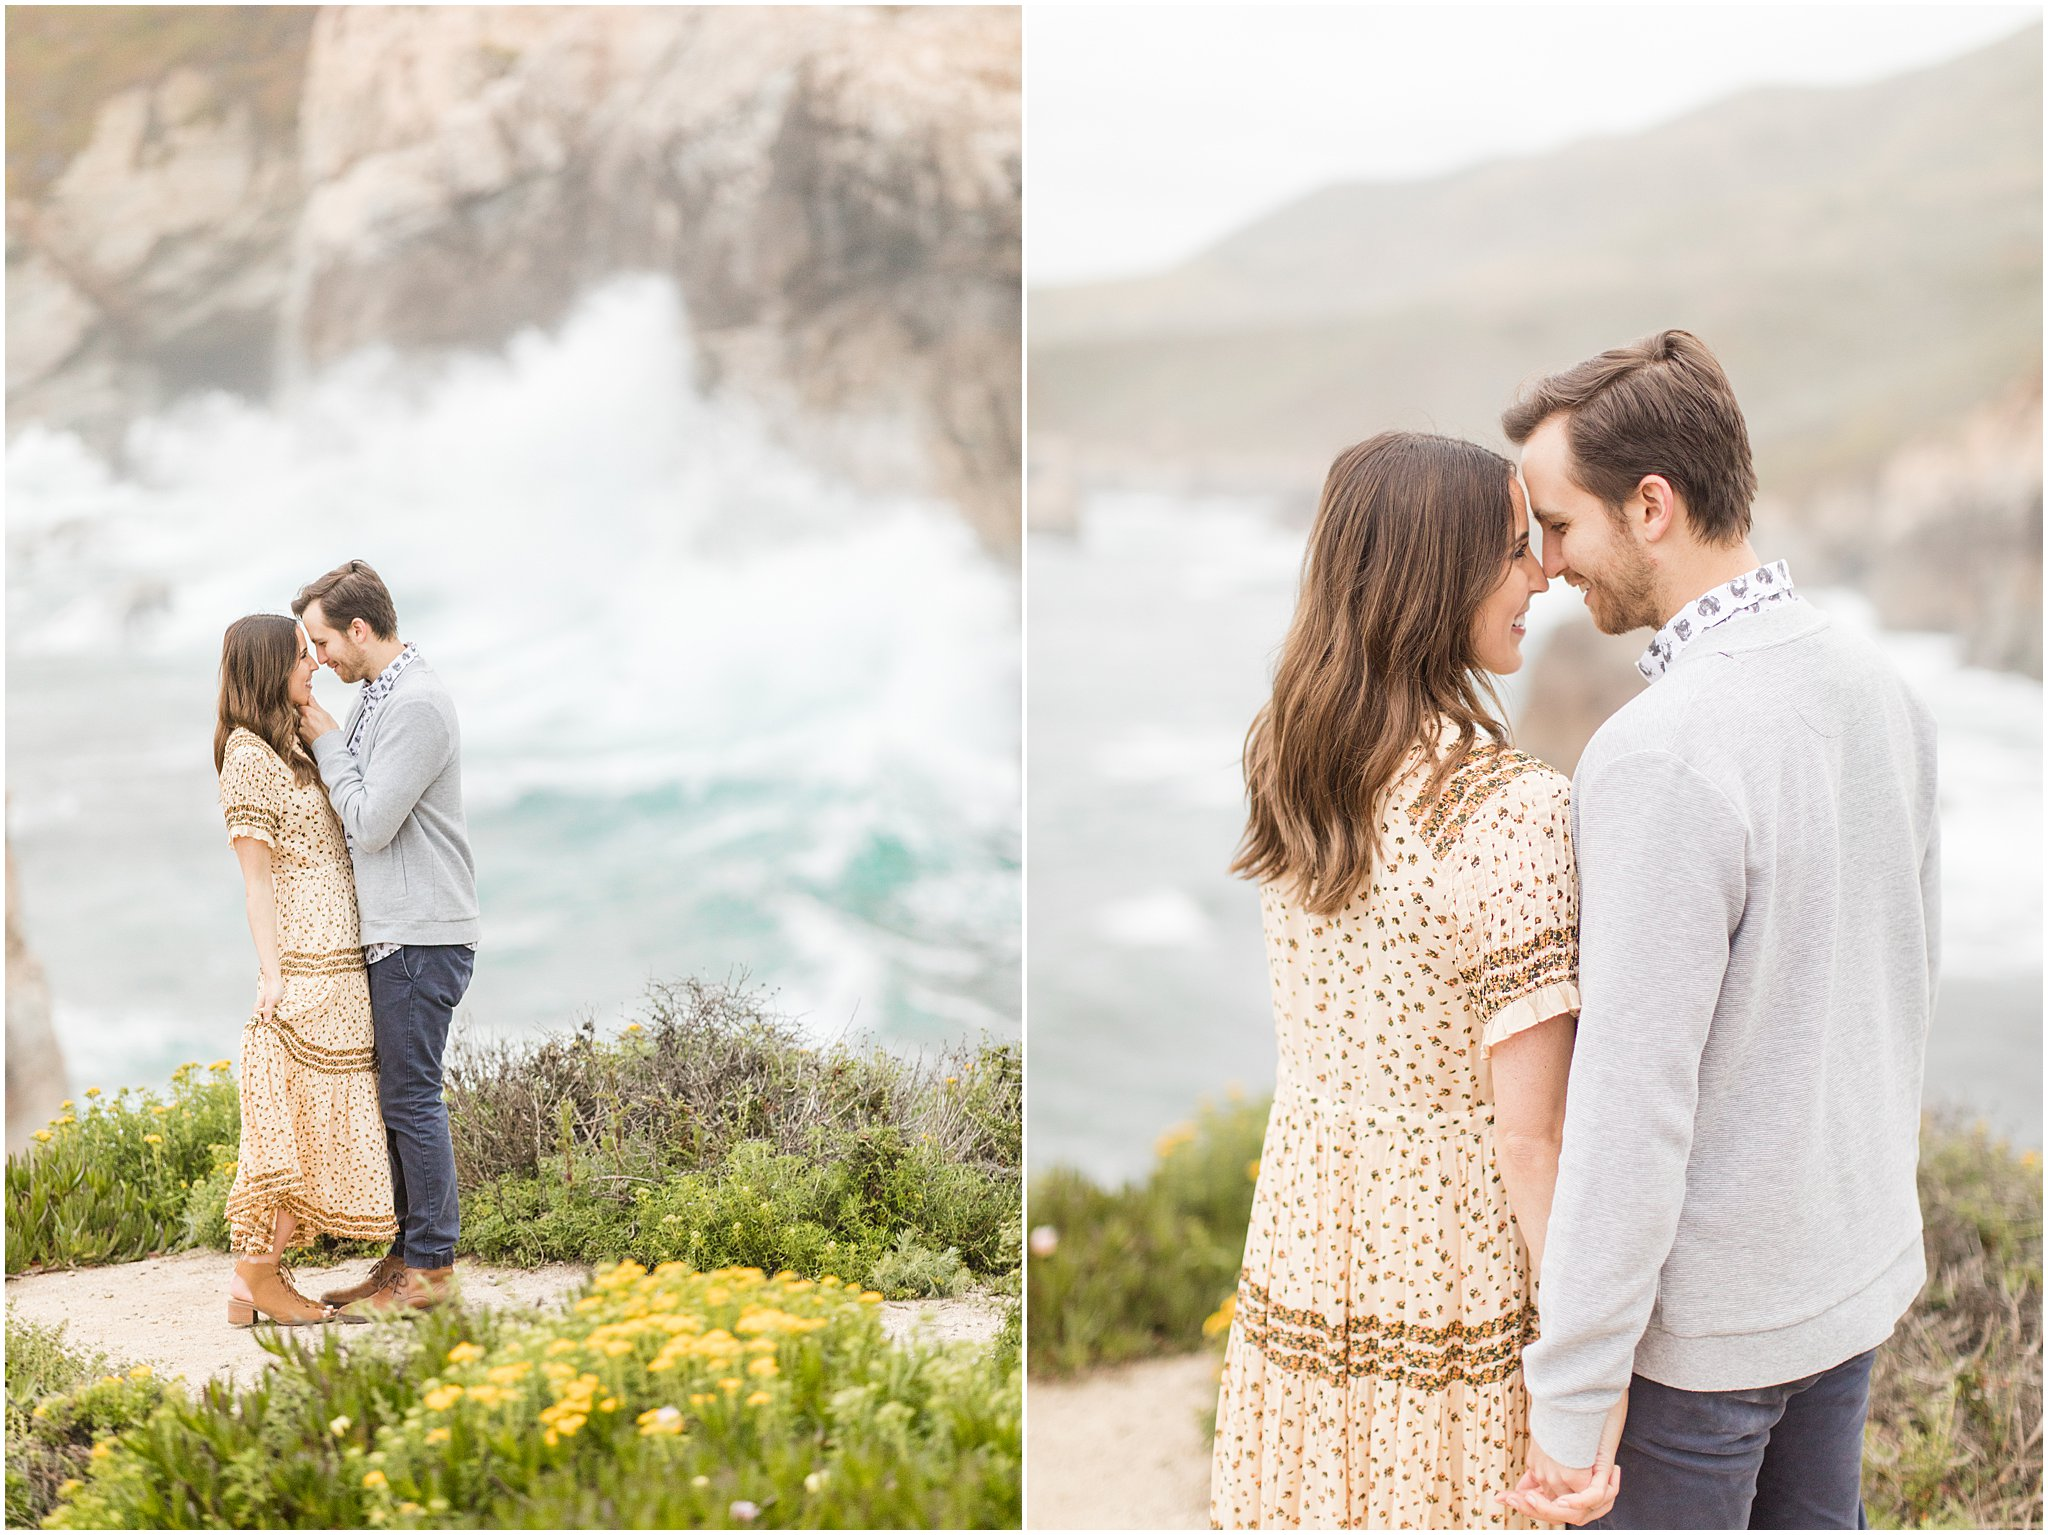 2019 carmel highlands garrapata state park couples portrait session bay area wedding photographer_0010.jpg